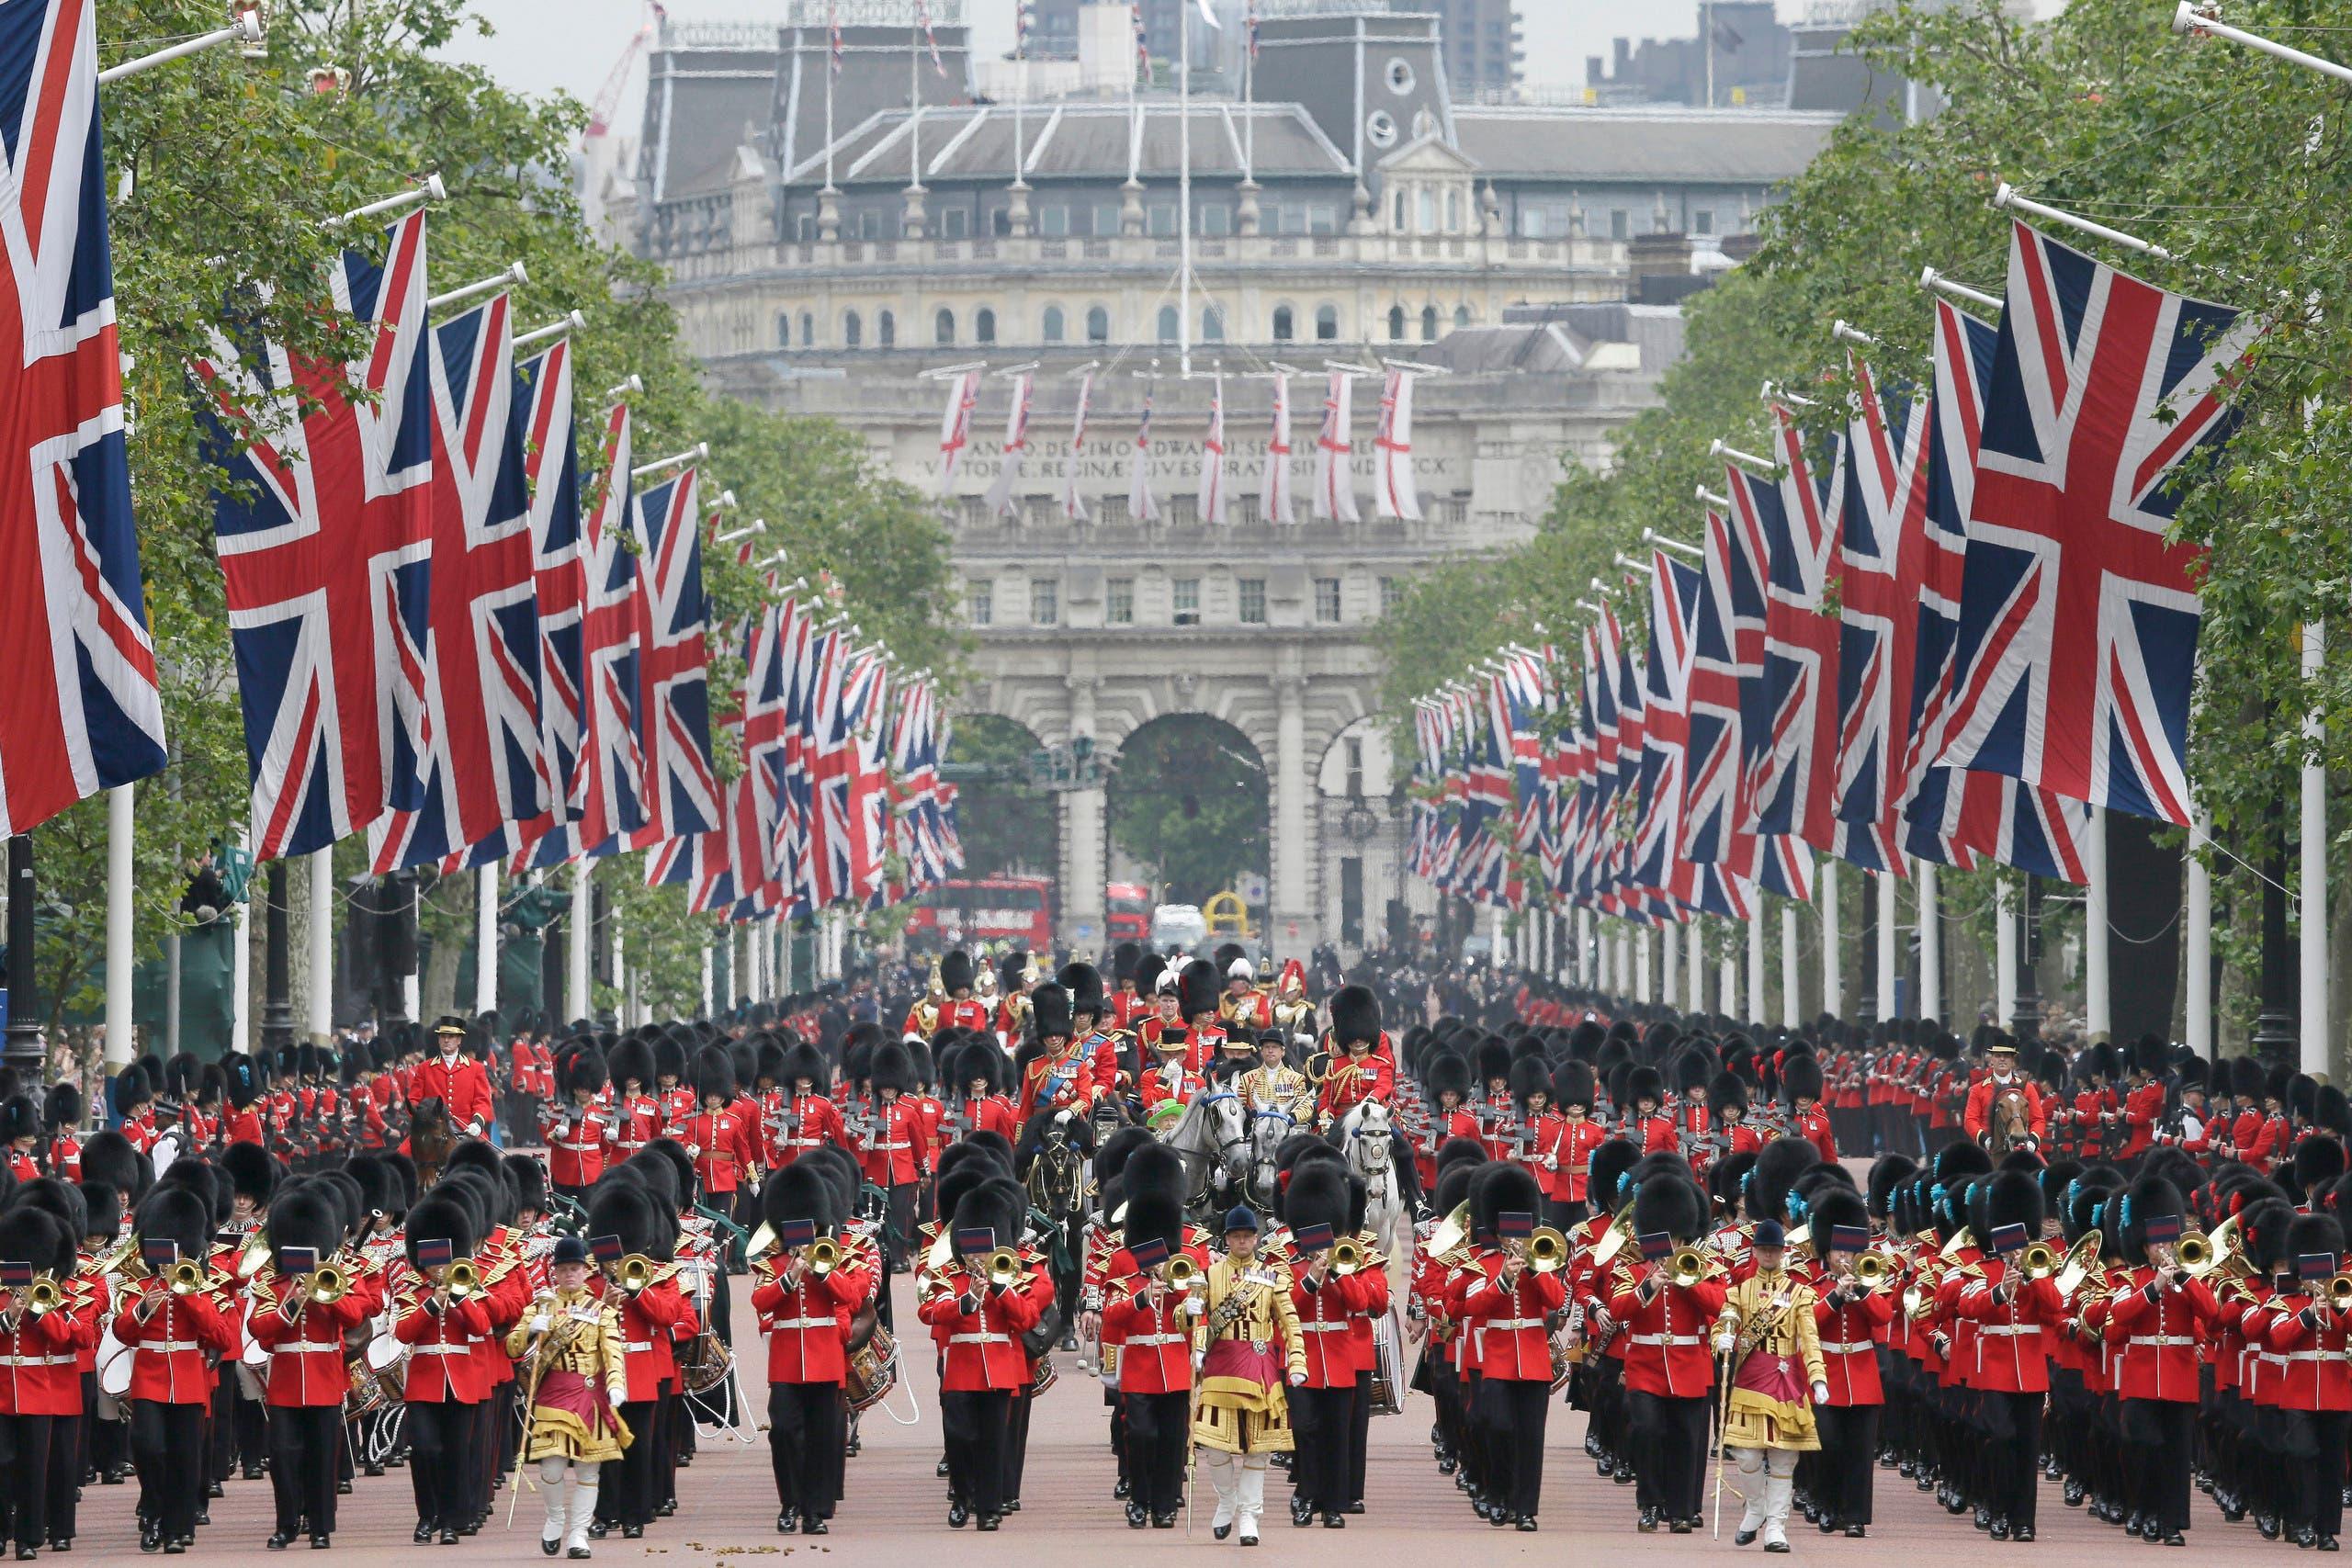 Britain's Queen Elizabeth II celebrates 90th birthday